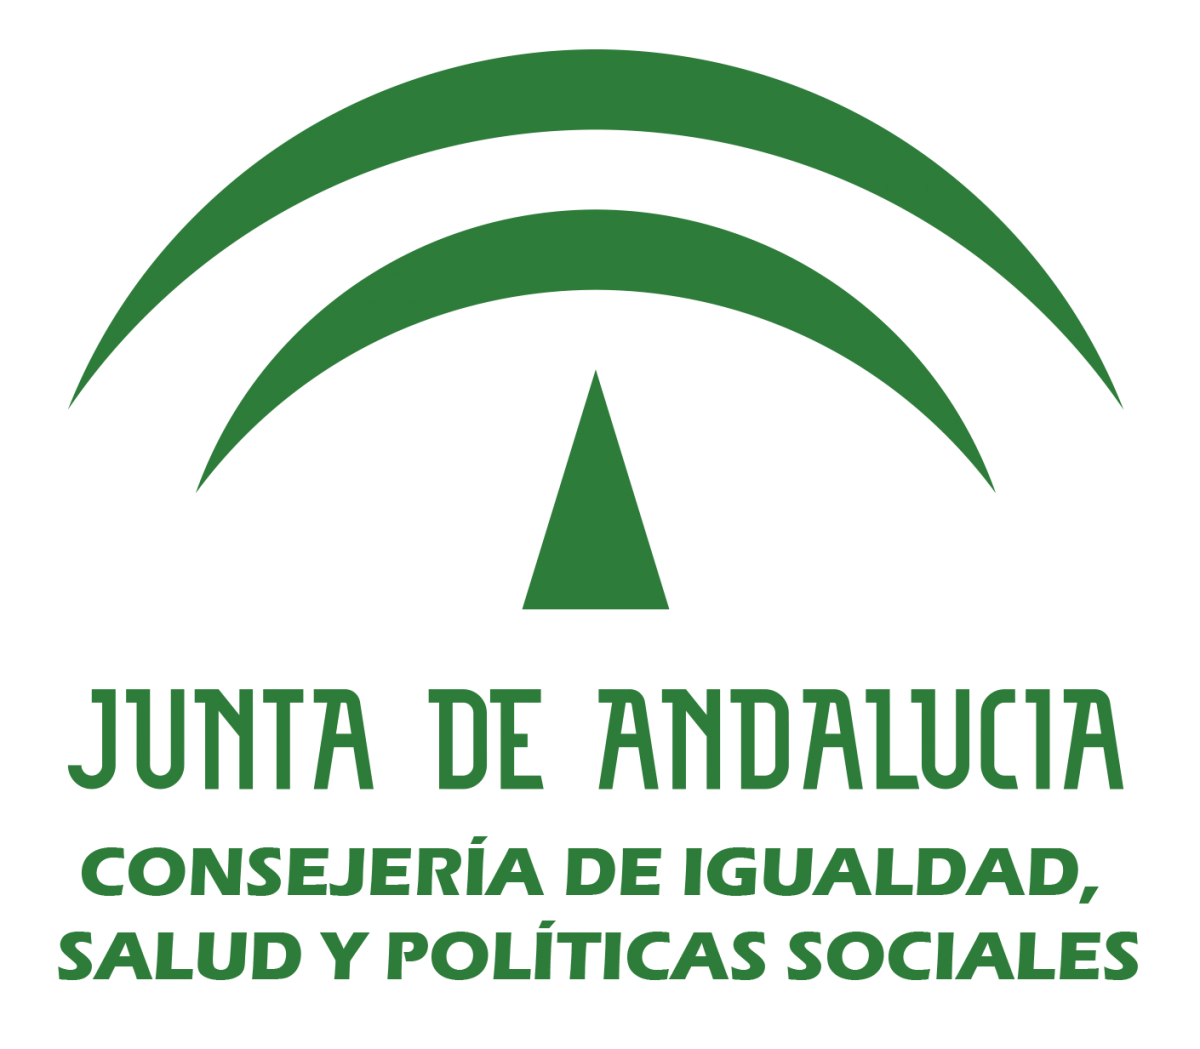 junta de andalusia es: